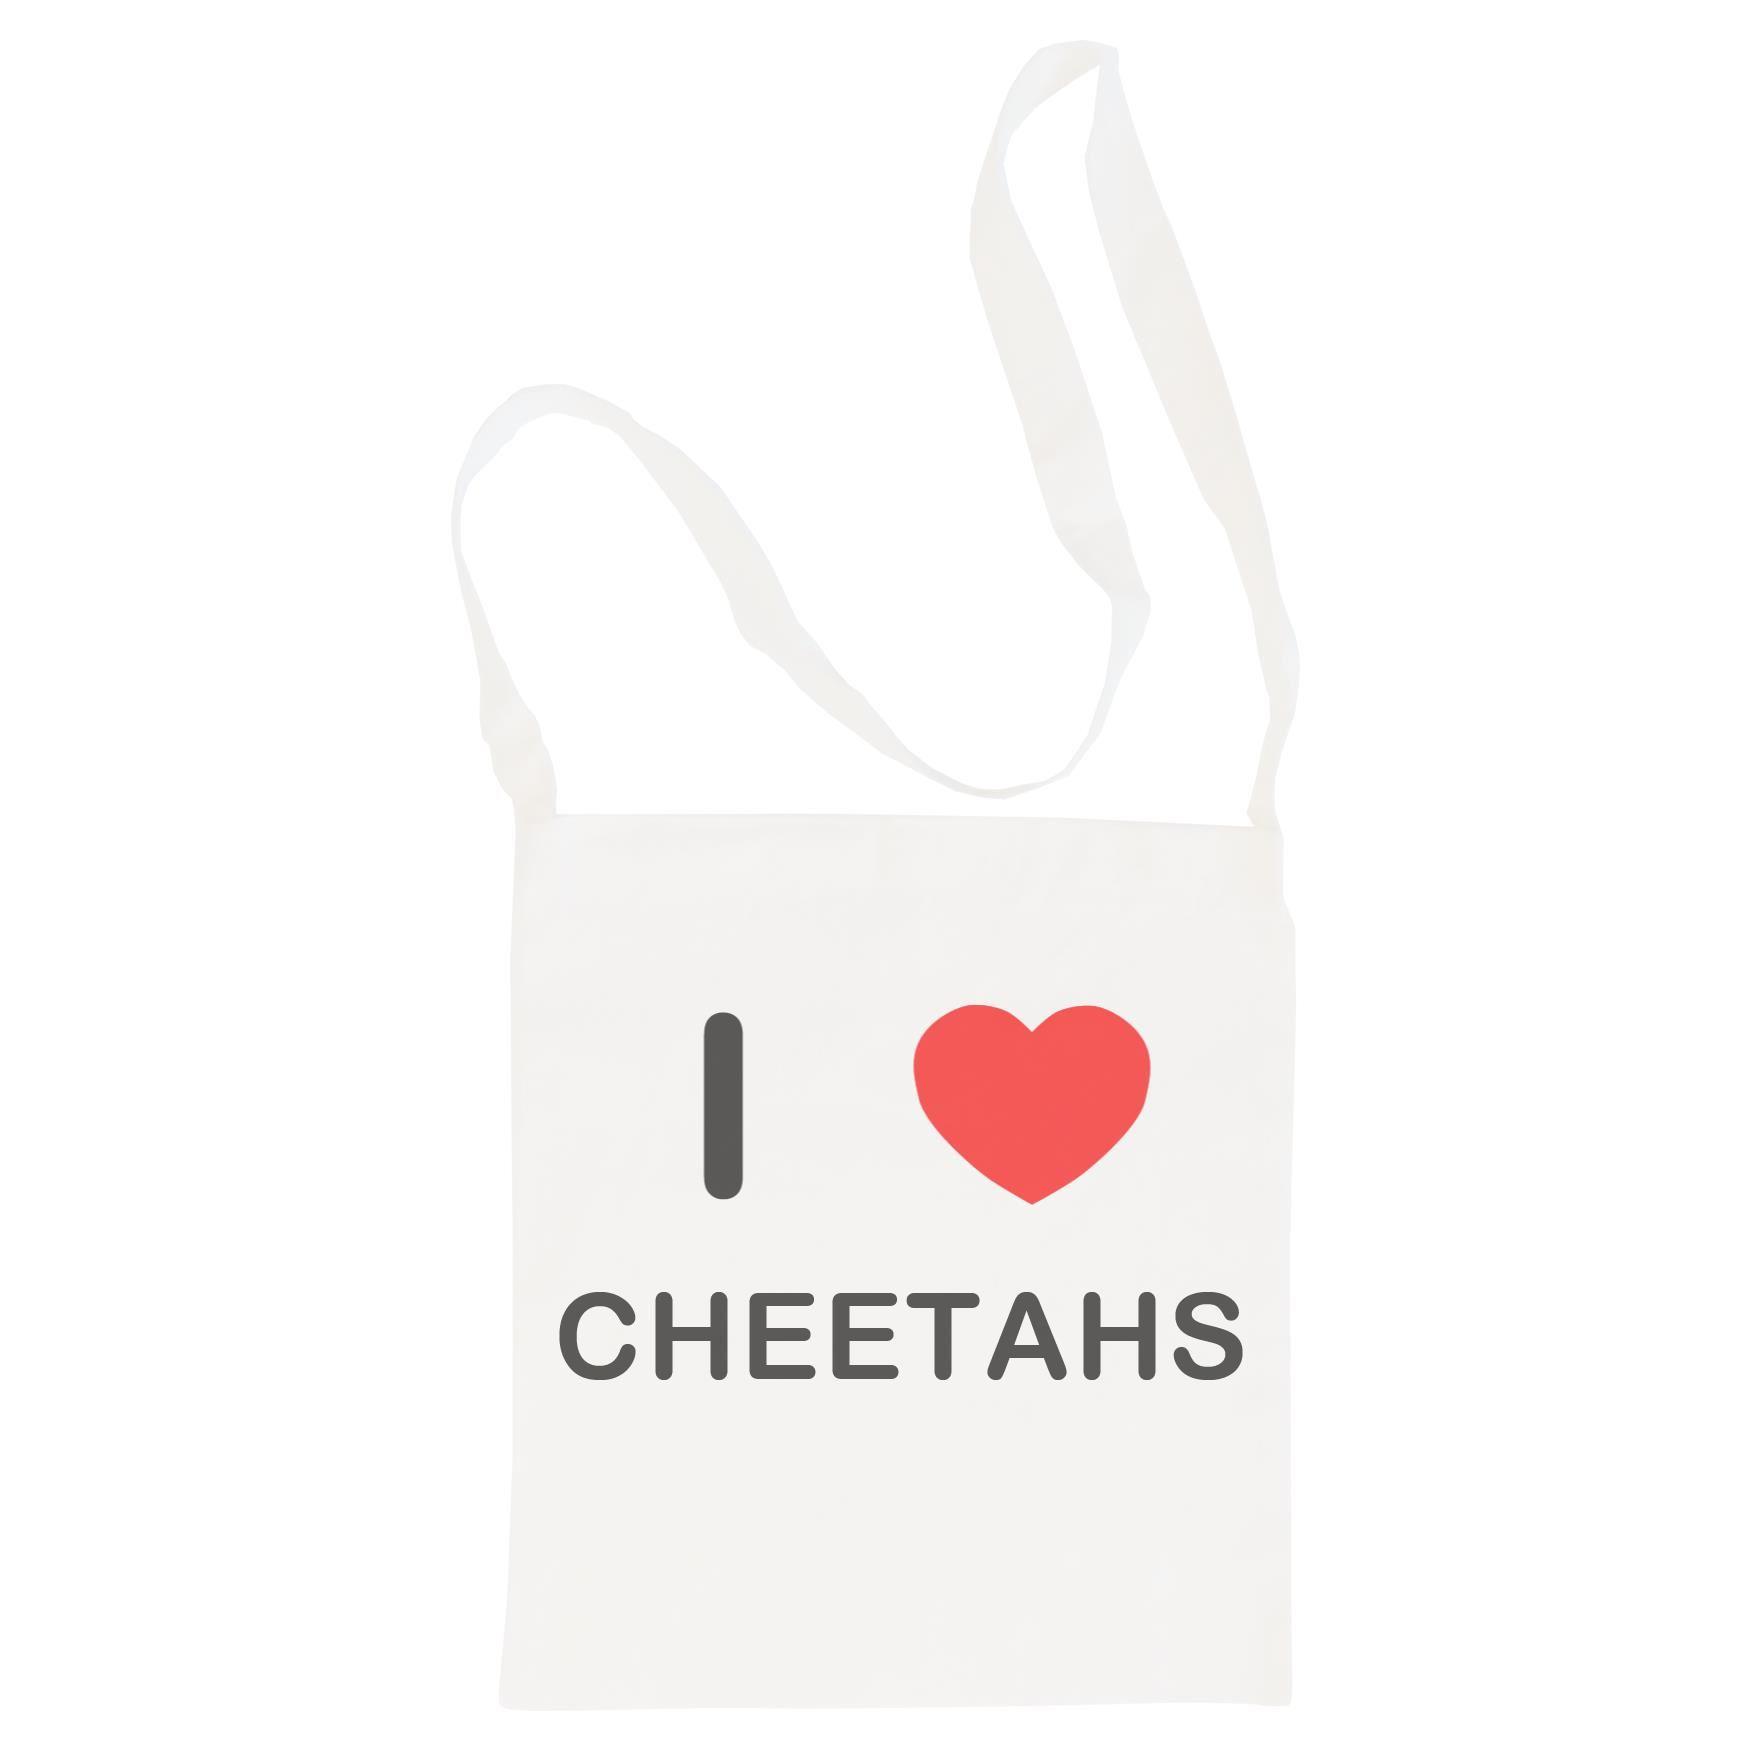 I Love Cheetahs - Cotton Bag | Size choice Tote, Shopper or Sling